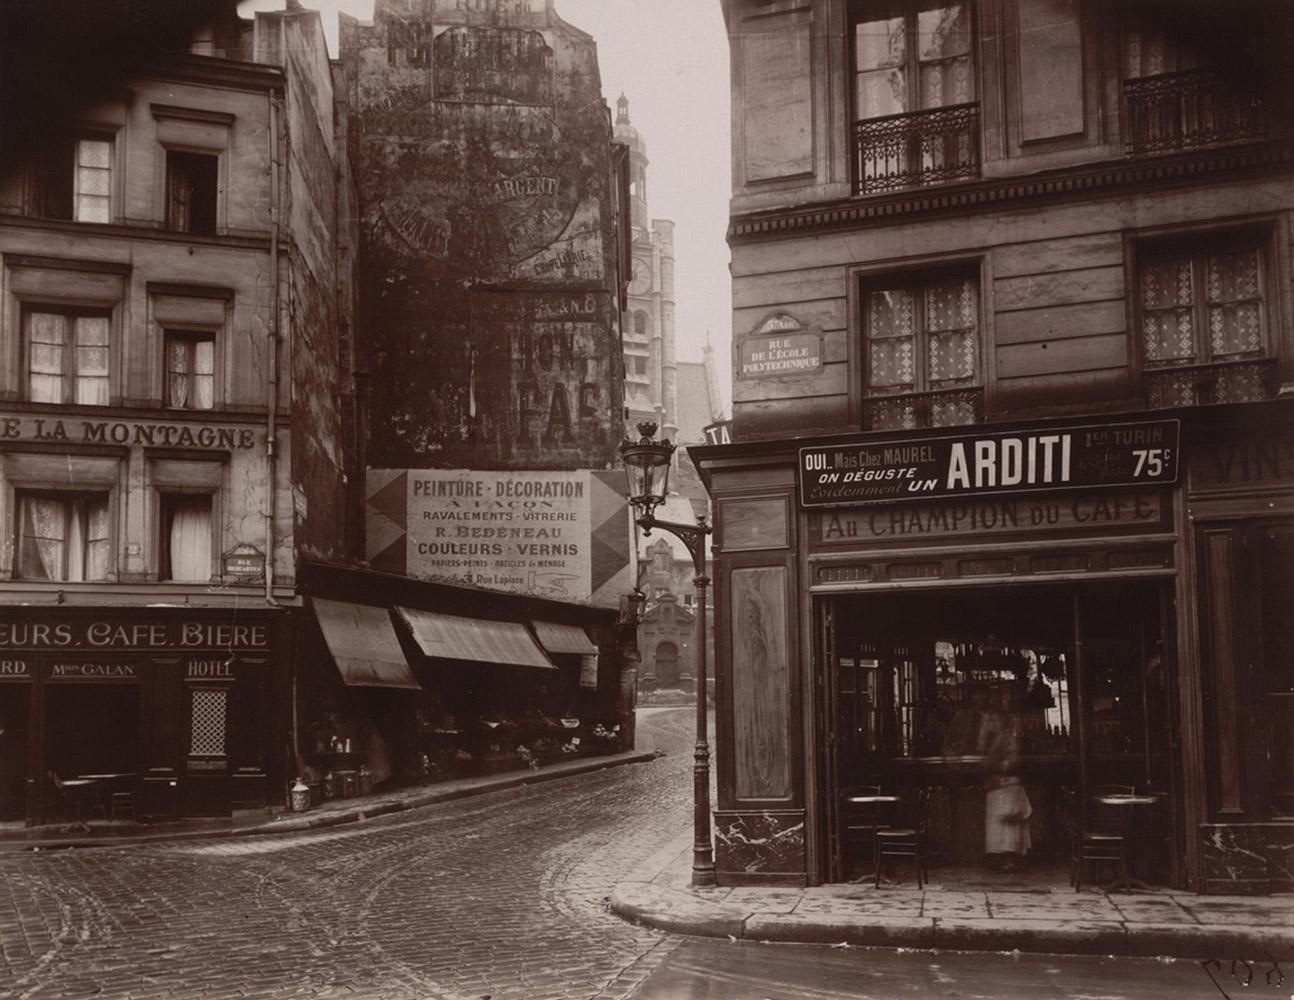 Rue de la Montagne-Sainte-Geneviève, 1925